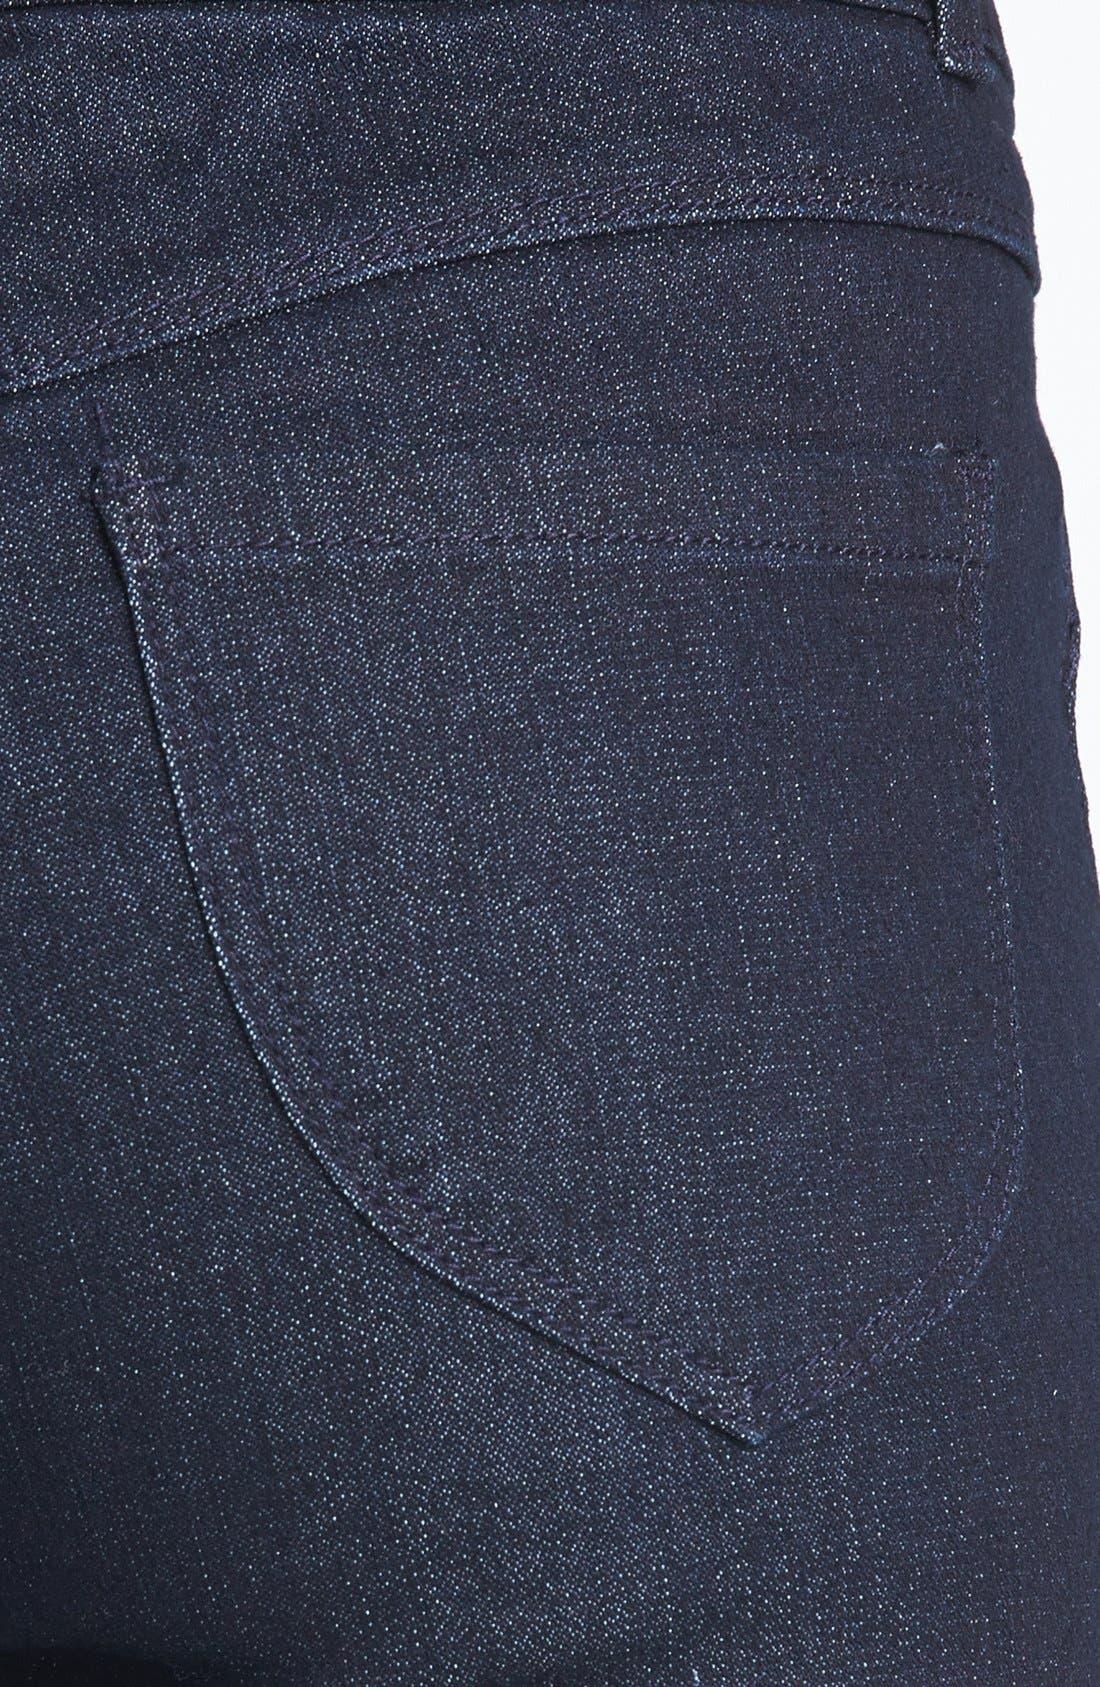 Alternate Image 3  - Jolt High Waist Skinny Ankle Jeans (Juniors) (Online Only)